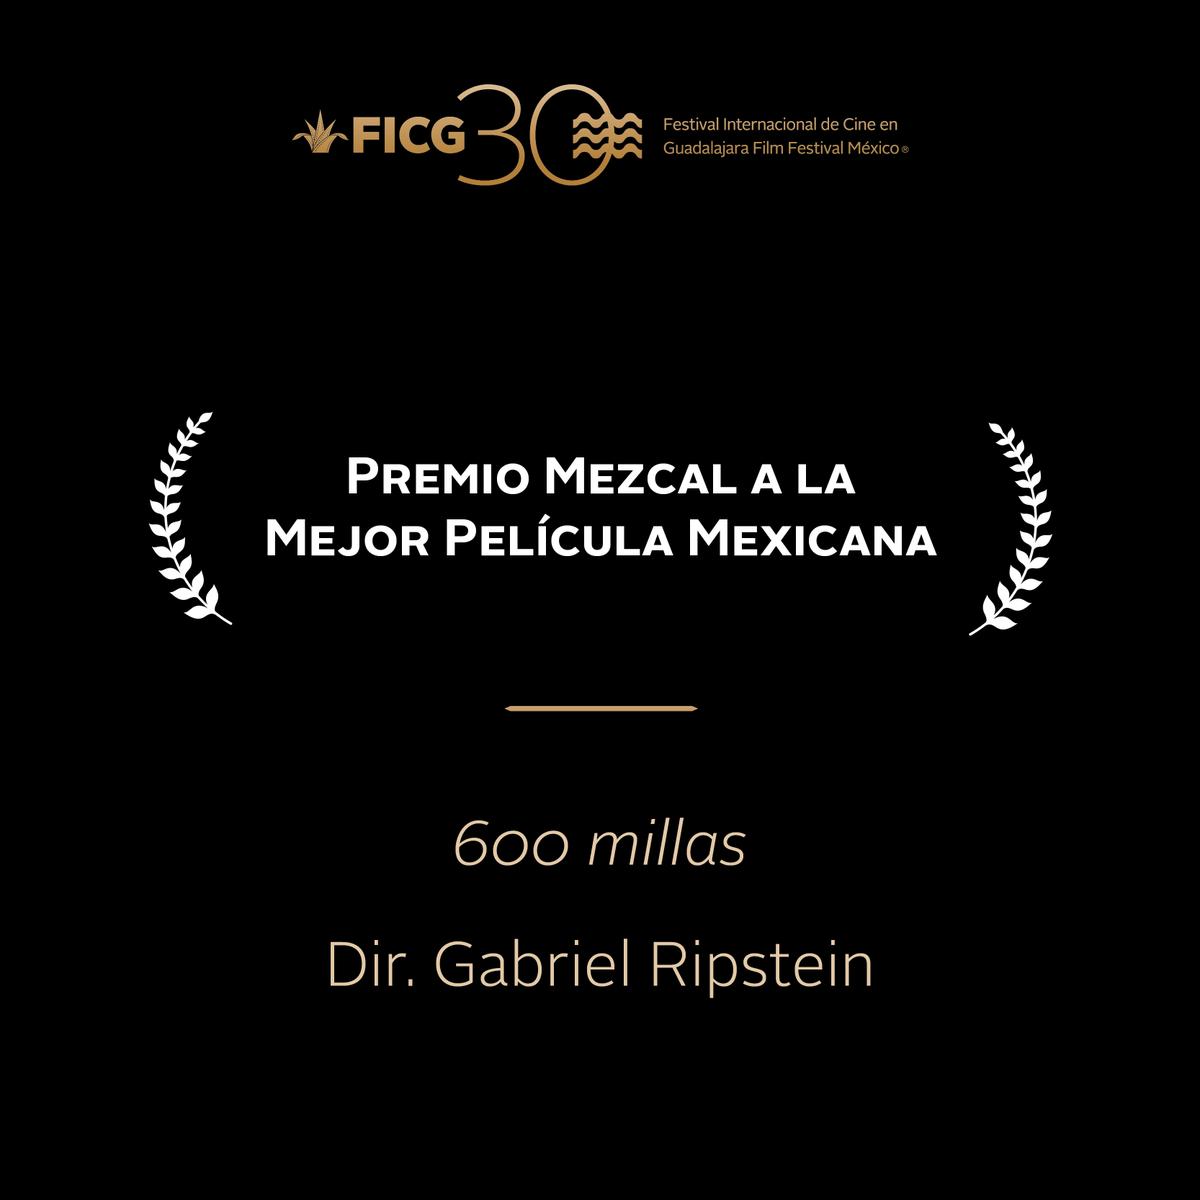 #FICG30  - Premio Mezcal  ''600 Millas'' / Dir. Gabriel Ripstein http://t.co/t99QnT7RMv